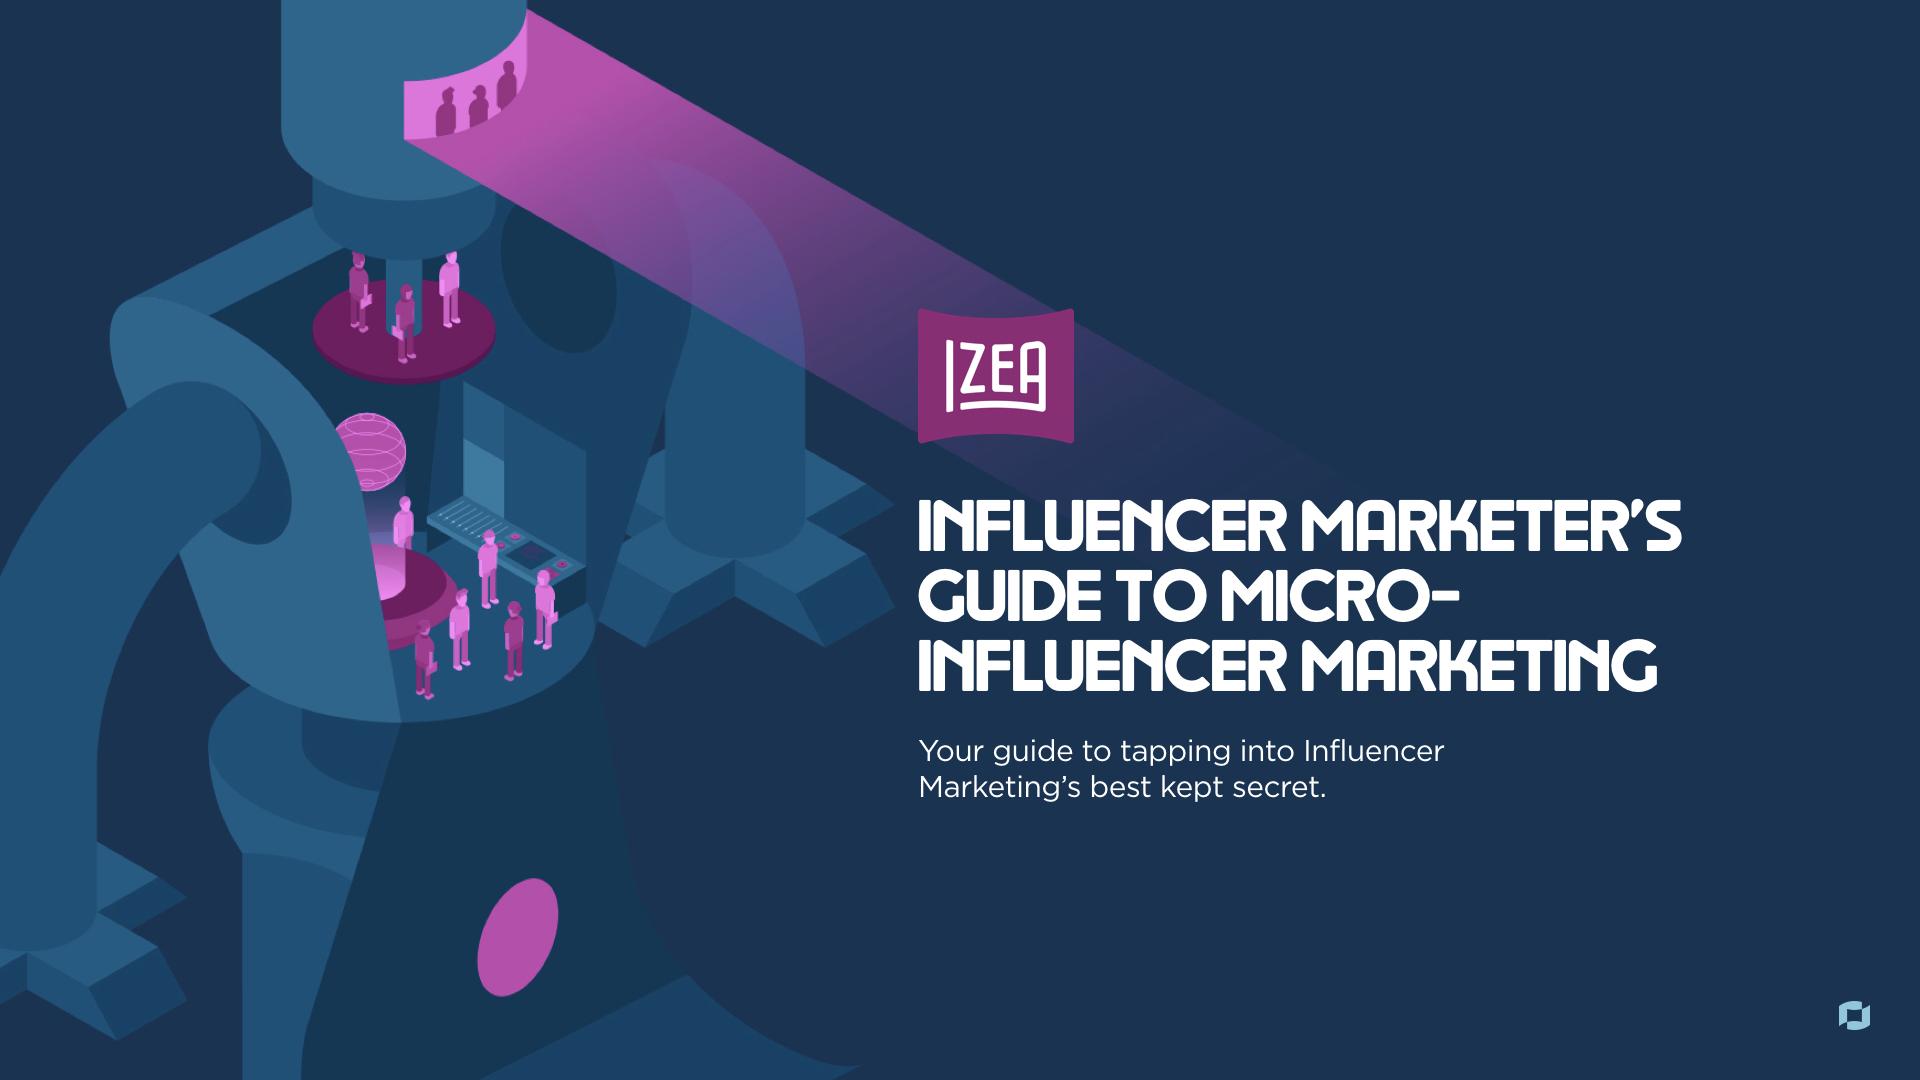 Micro-Influencer Marketing Ebook Cover